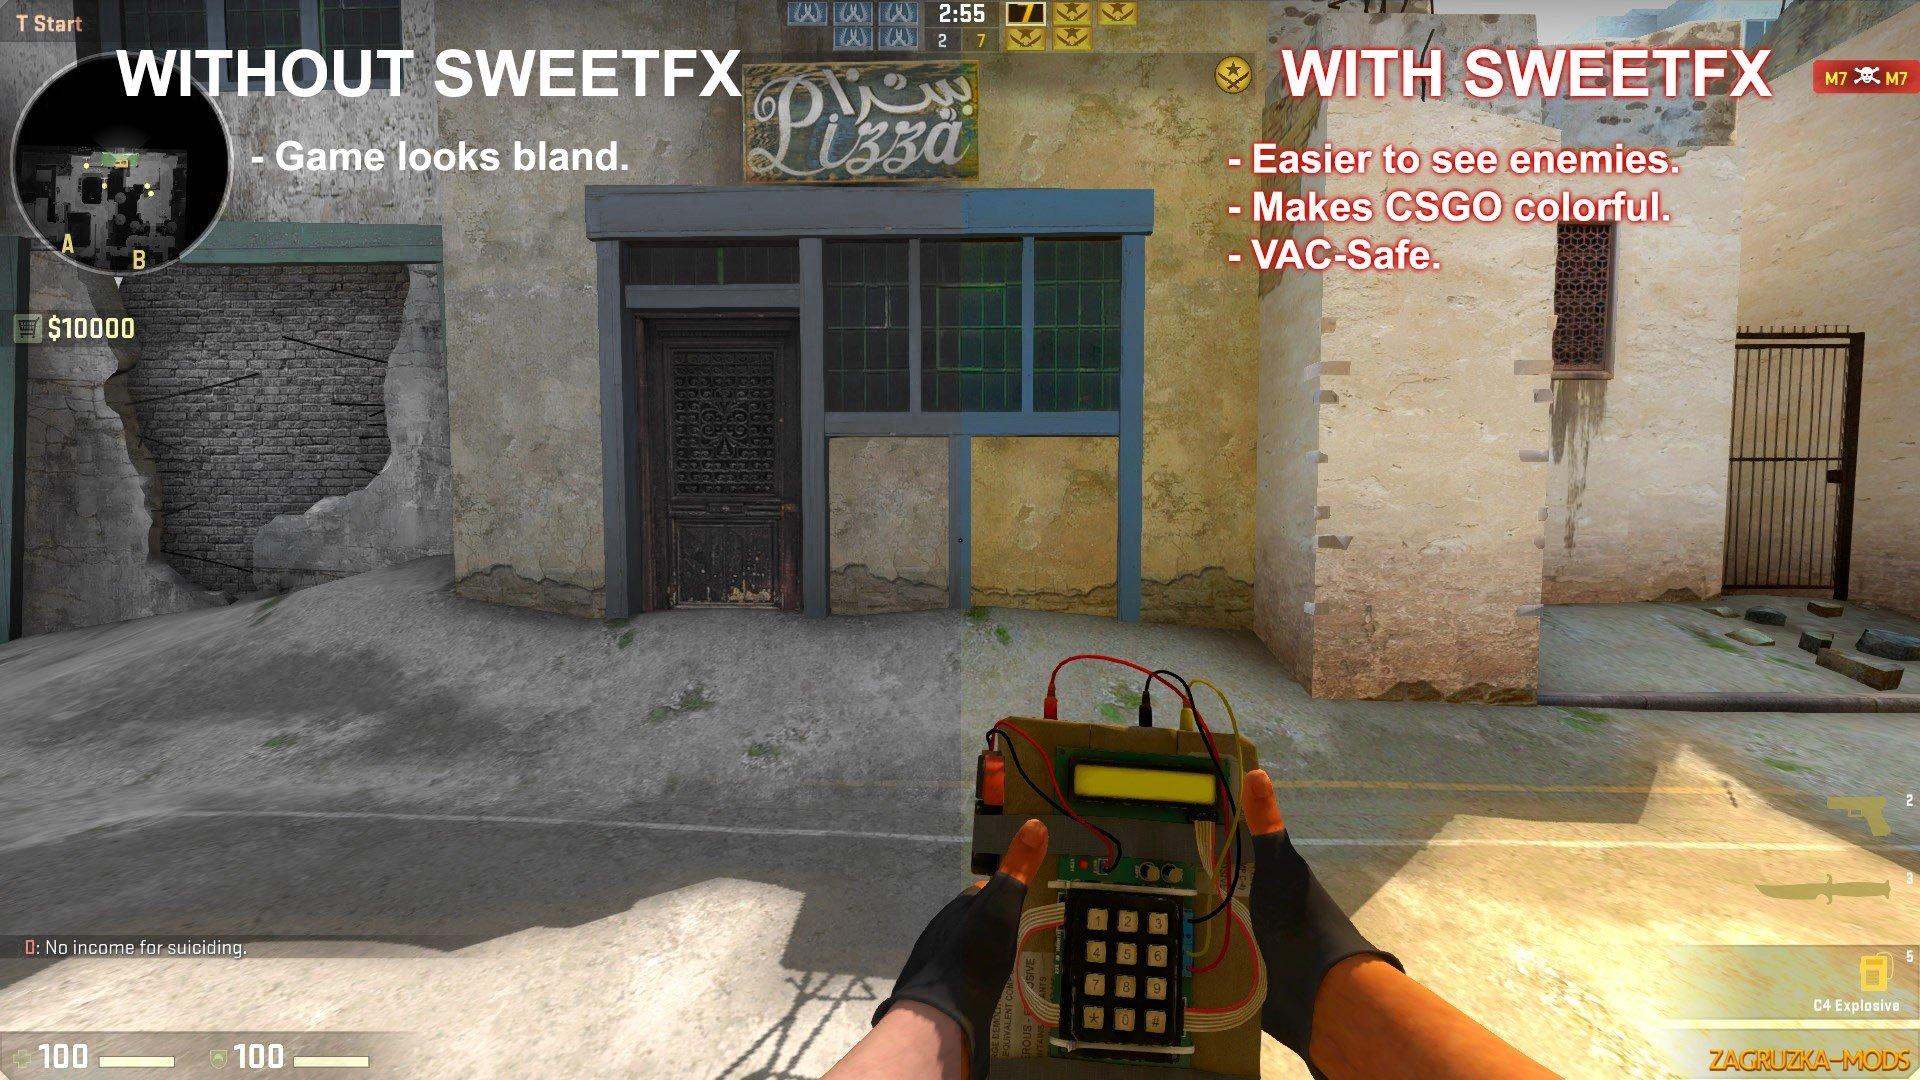 SweetFX Graphics Mod for CS:GO